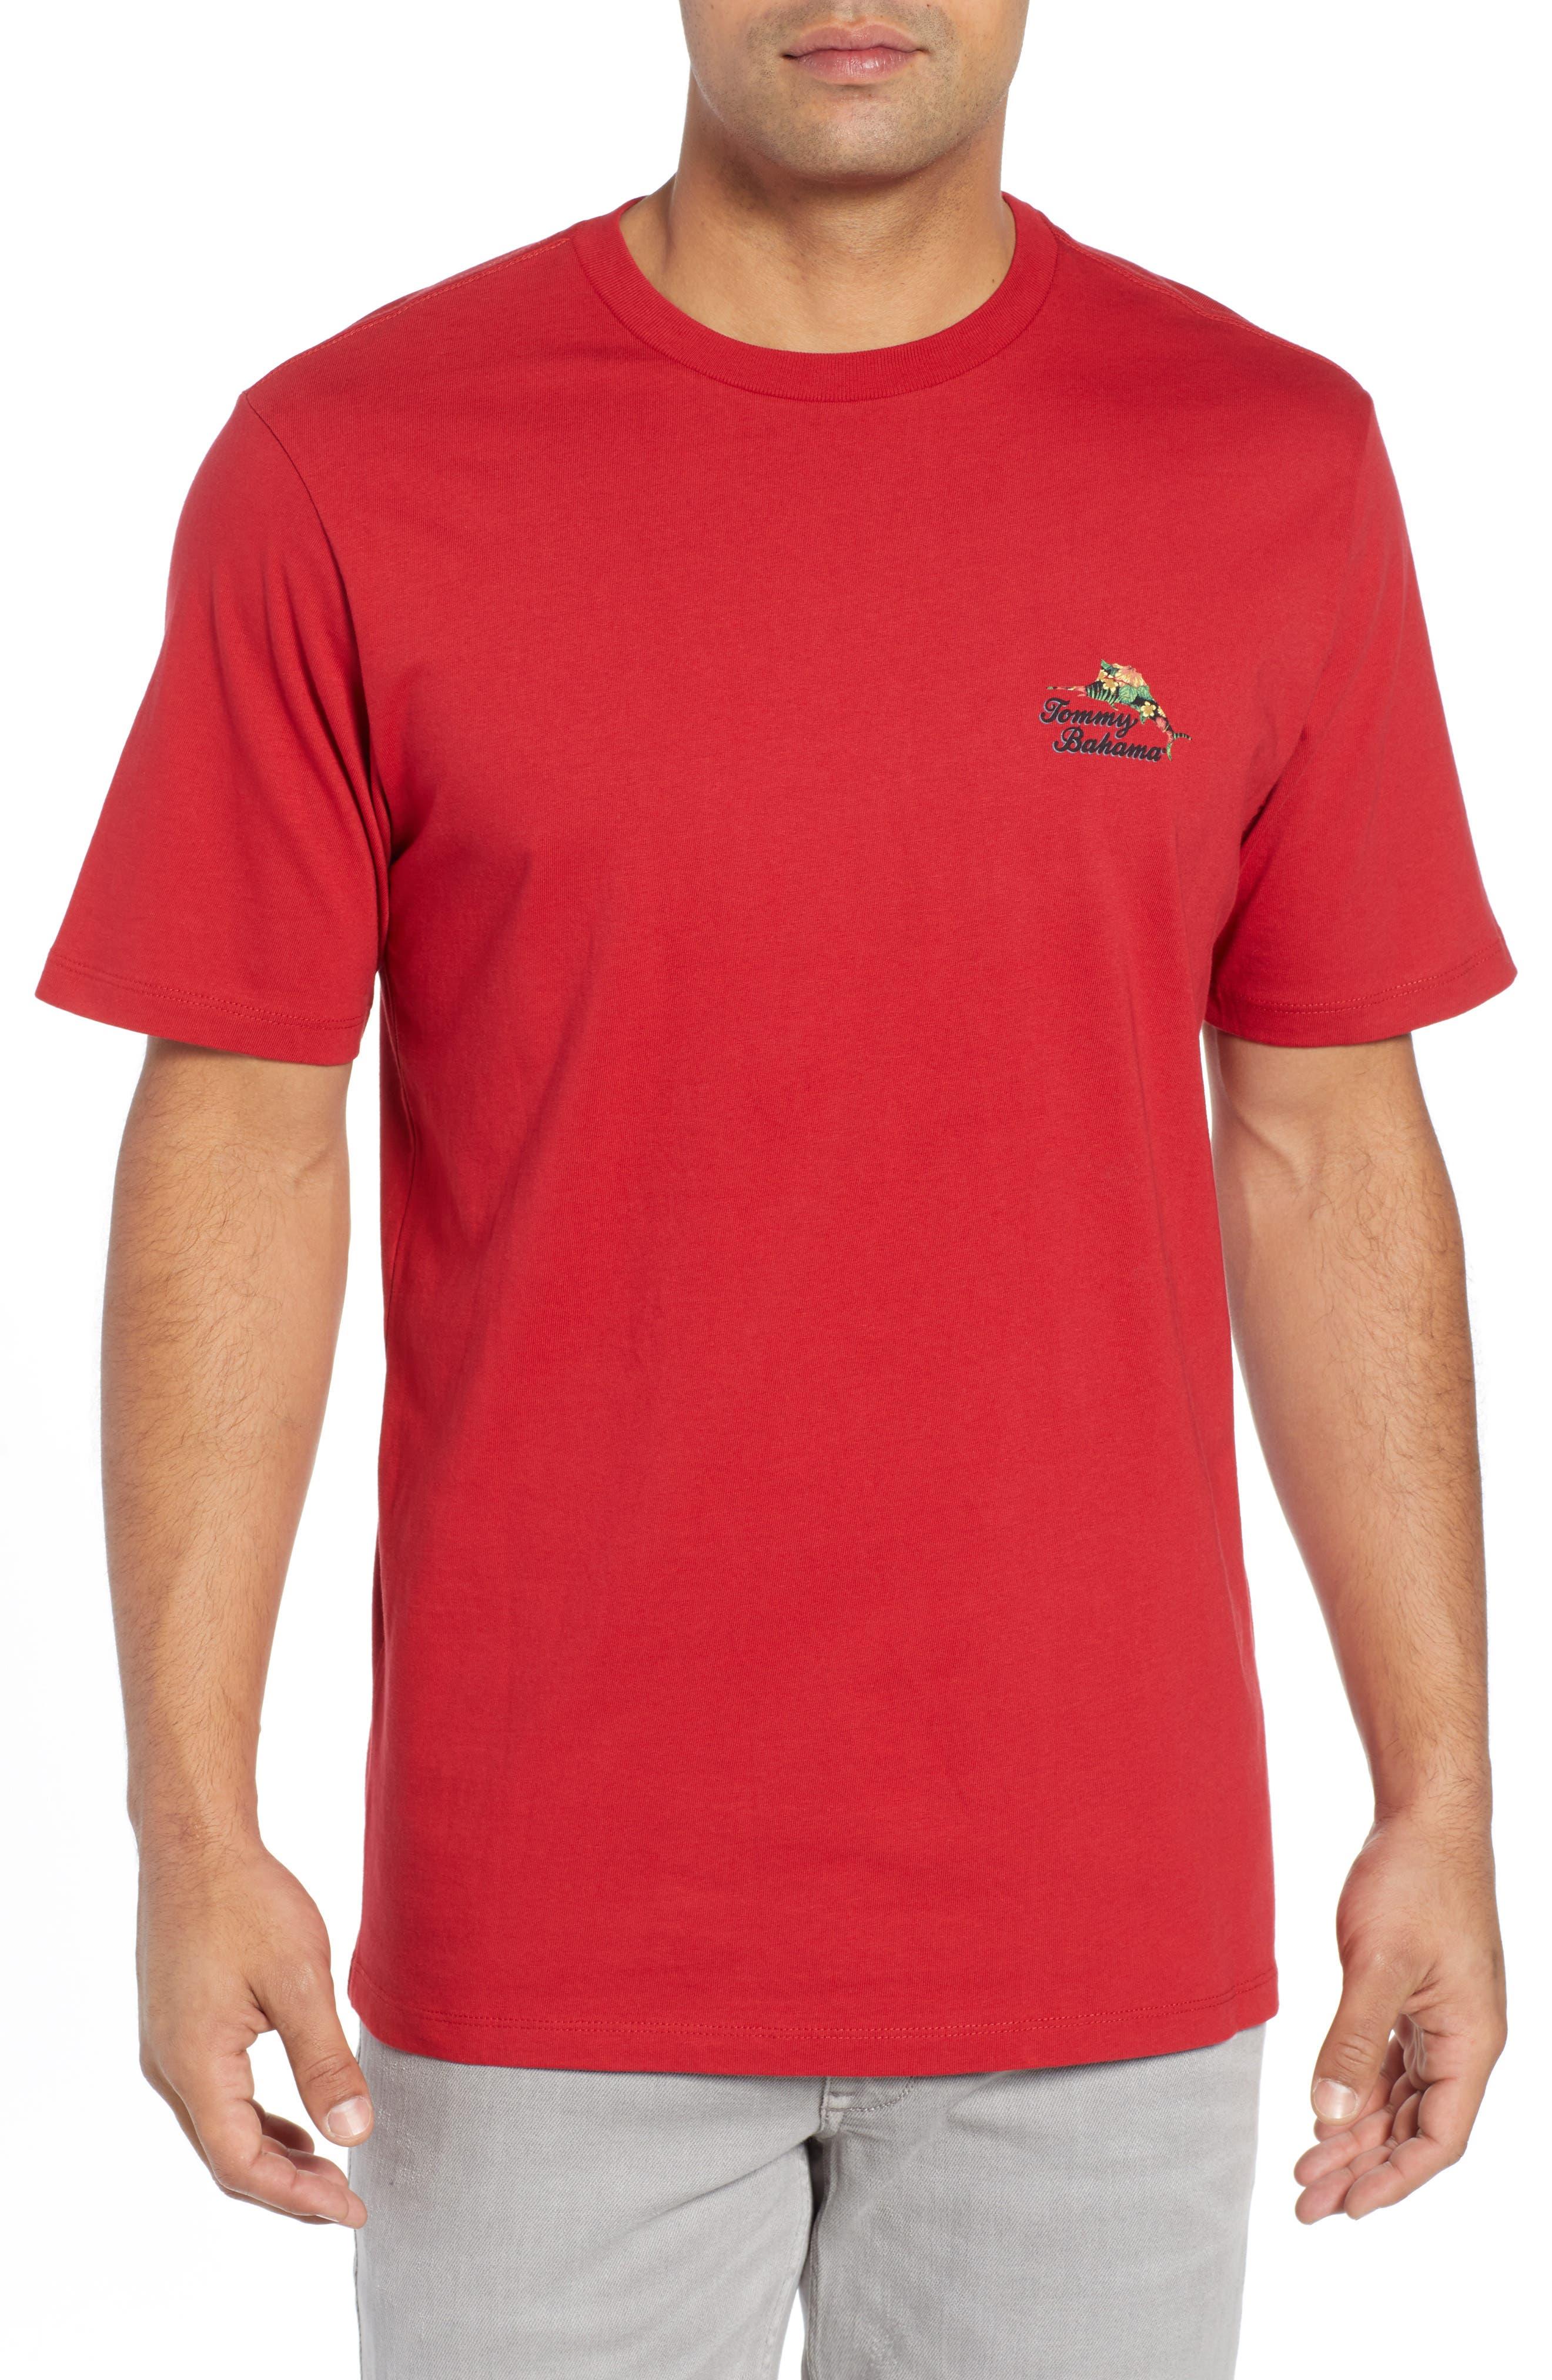 TOMMY BAHAMA, Alo-Ho Ho-Ha Graphic T-Shirt, Main thumbnail 1, color, SCOOTER RED